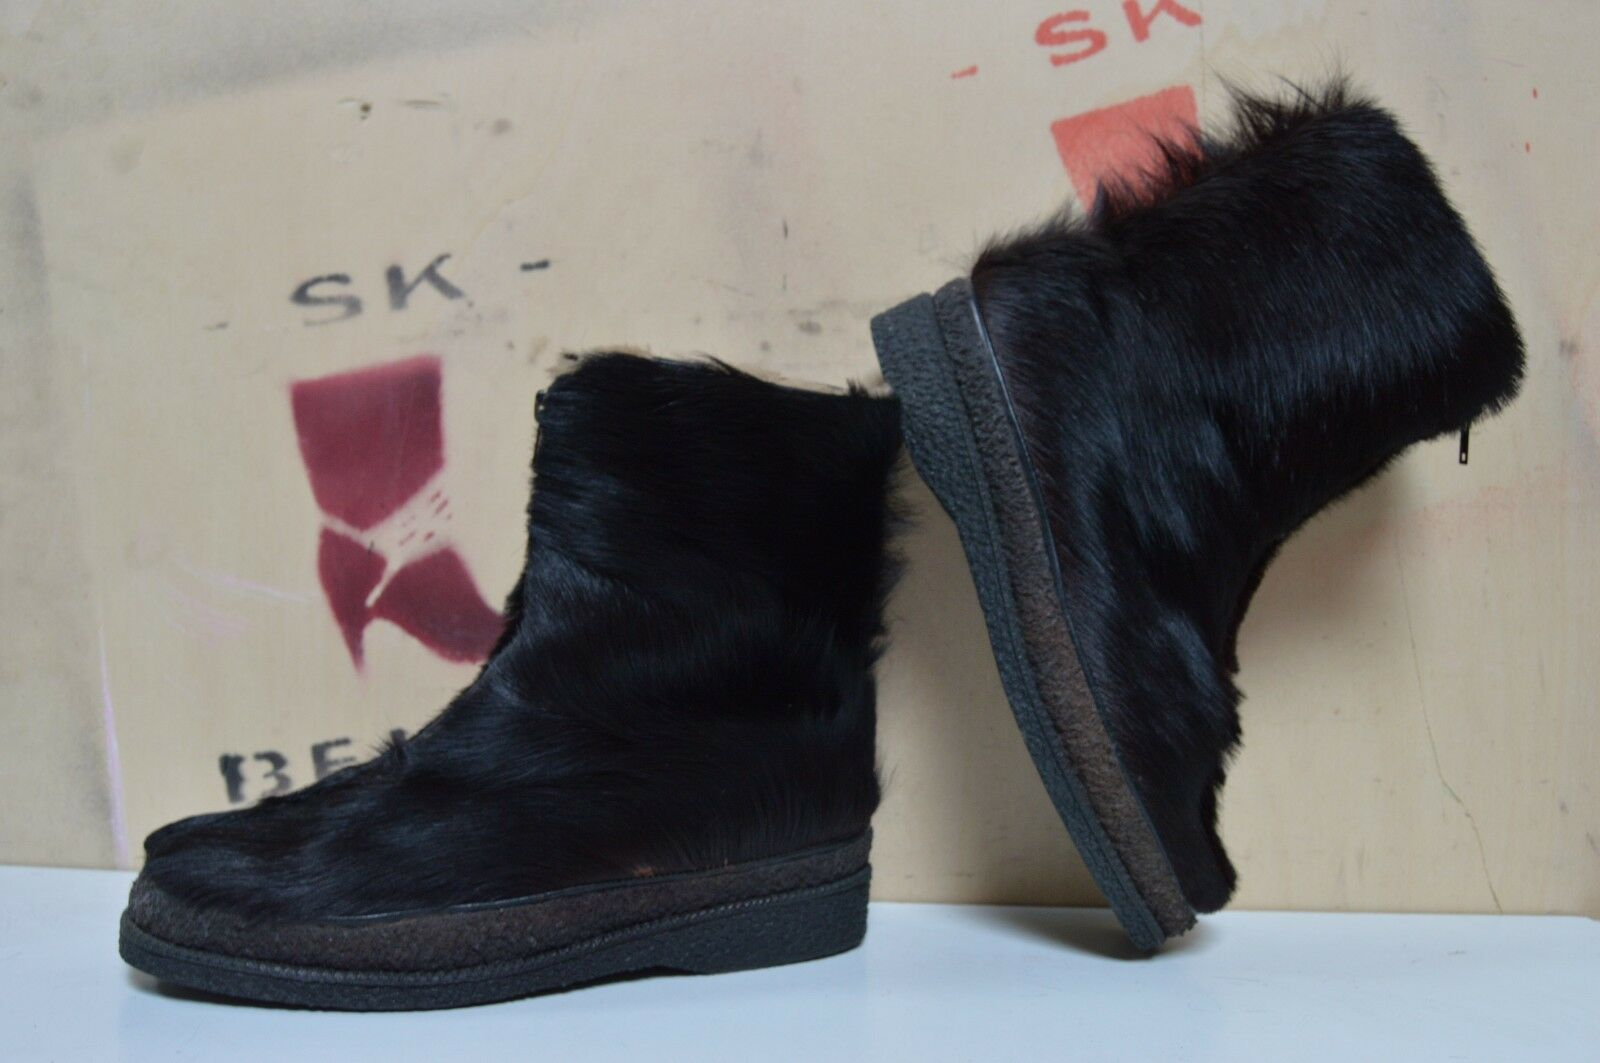 FellStiefel ARKTIS Boots Stiefel TRUE VINTAGE Fell Winterstiefel uk7,5 Yetiboots